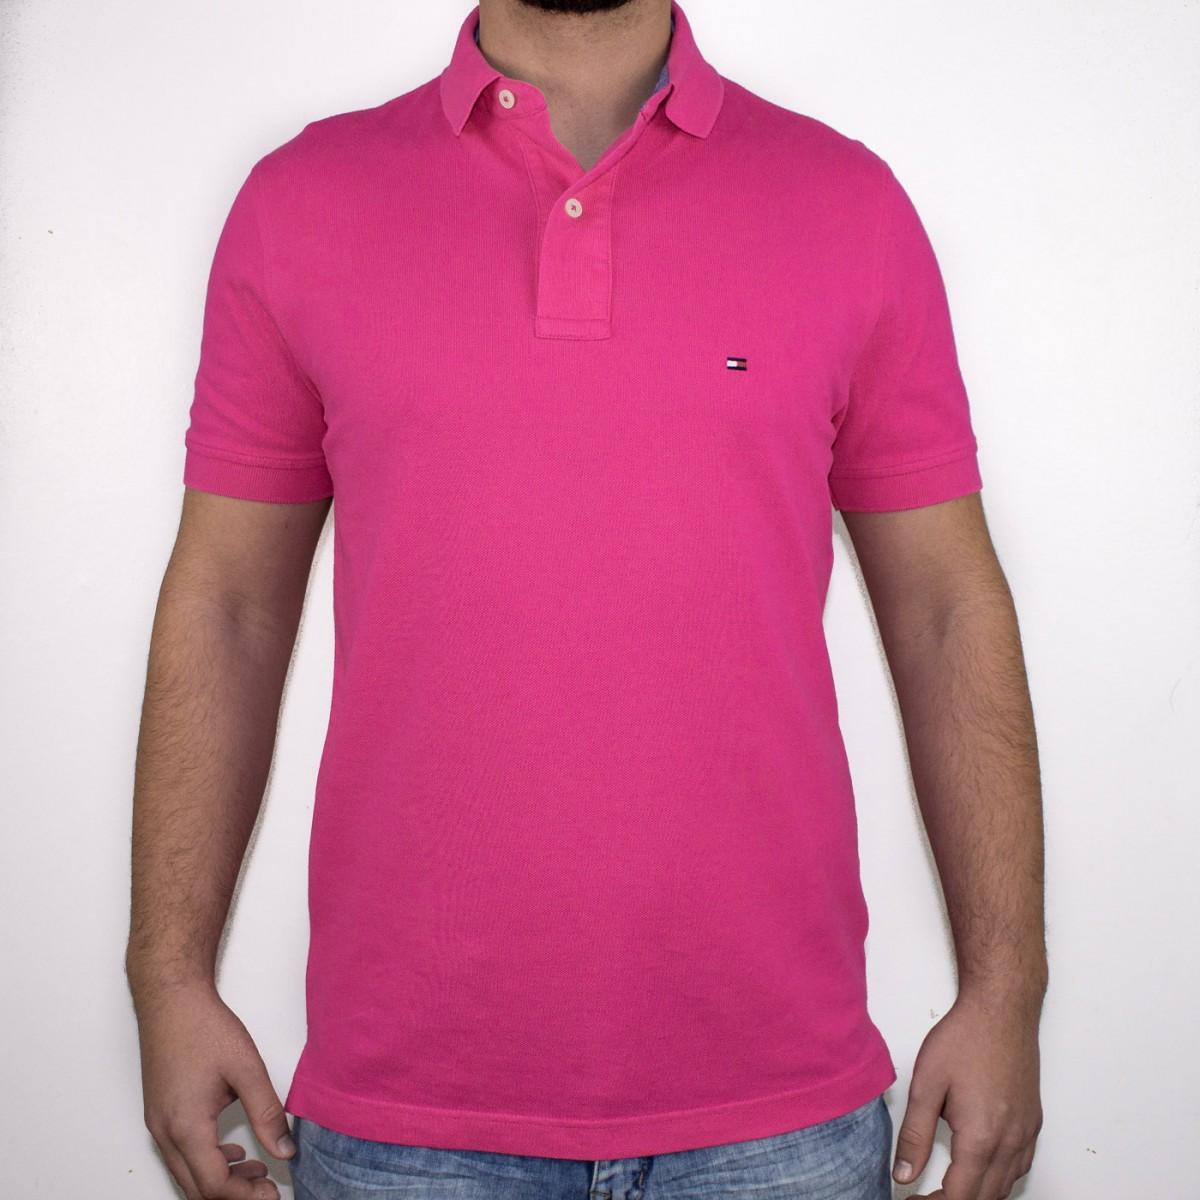 Bizz Store - Camisa Polo Masculina Tommy Hilfiger Manga Curta Rosa 021aa6ec0574b